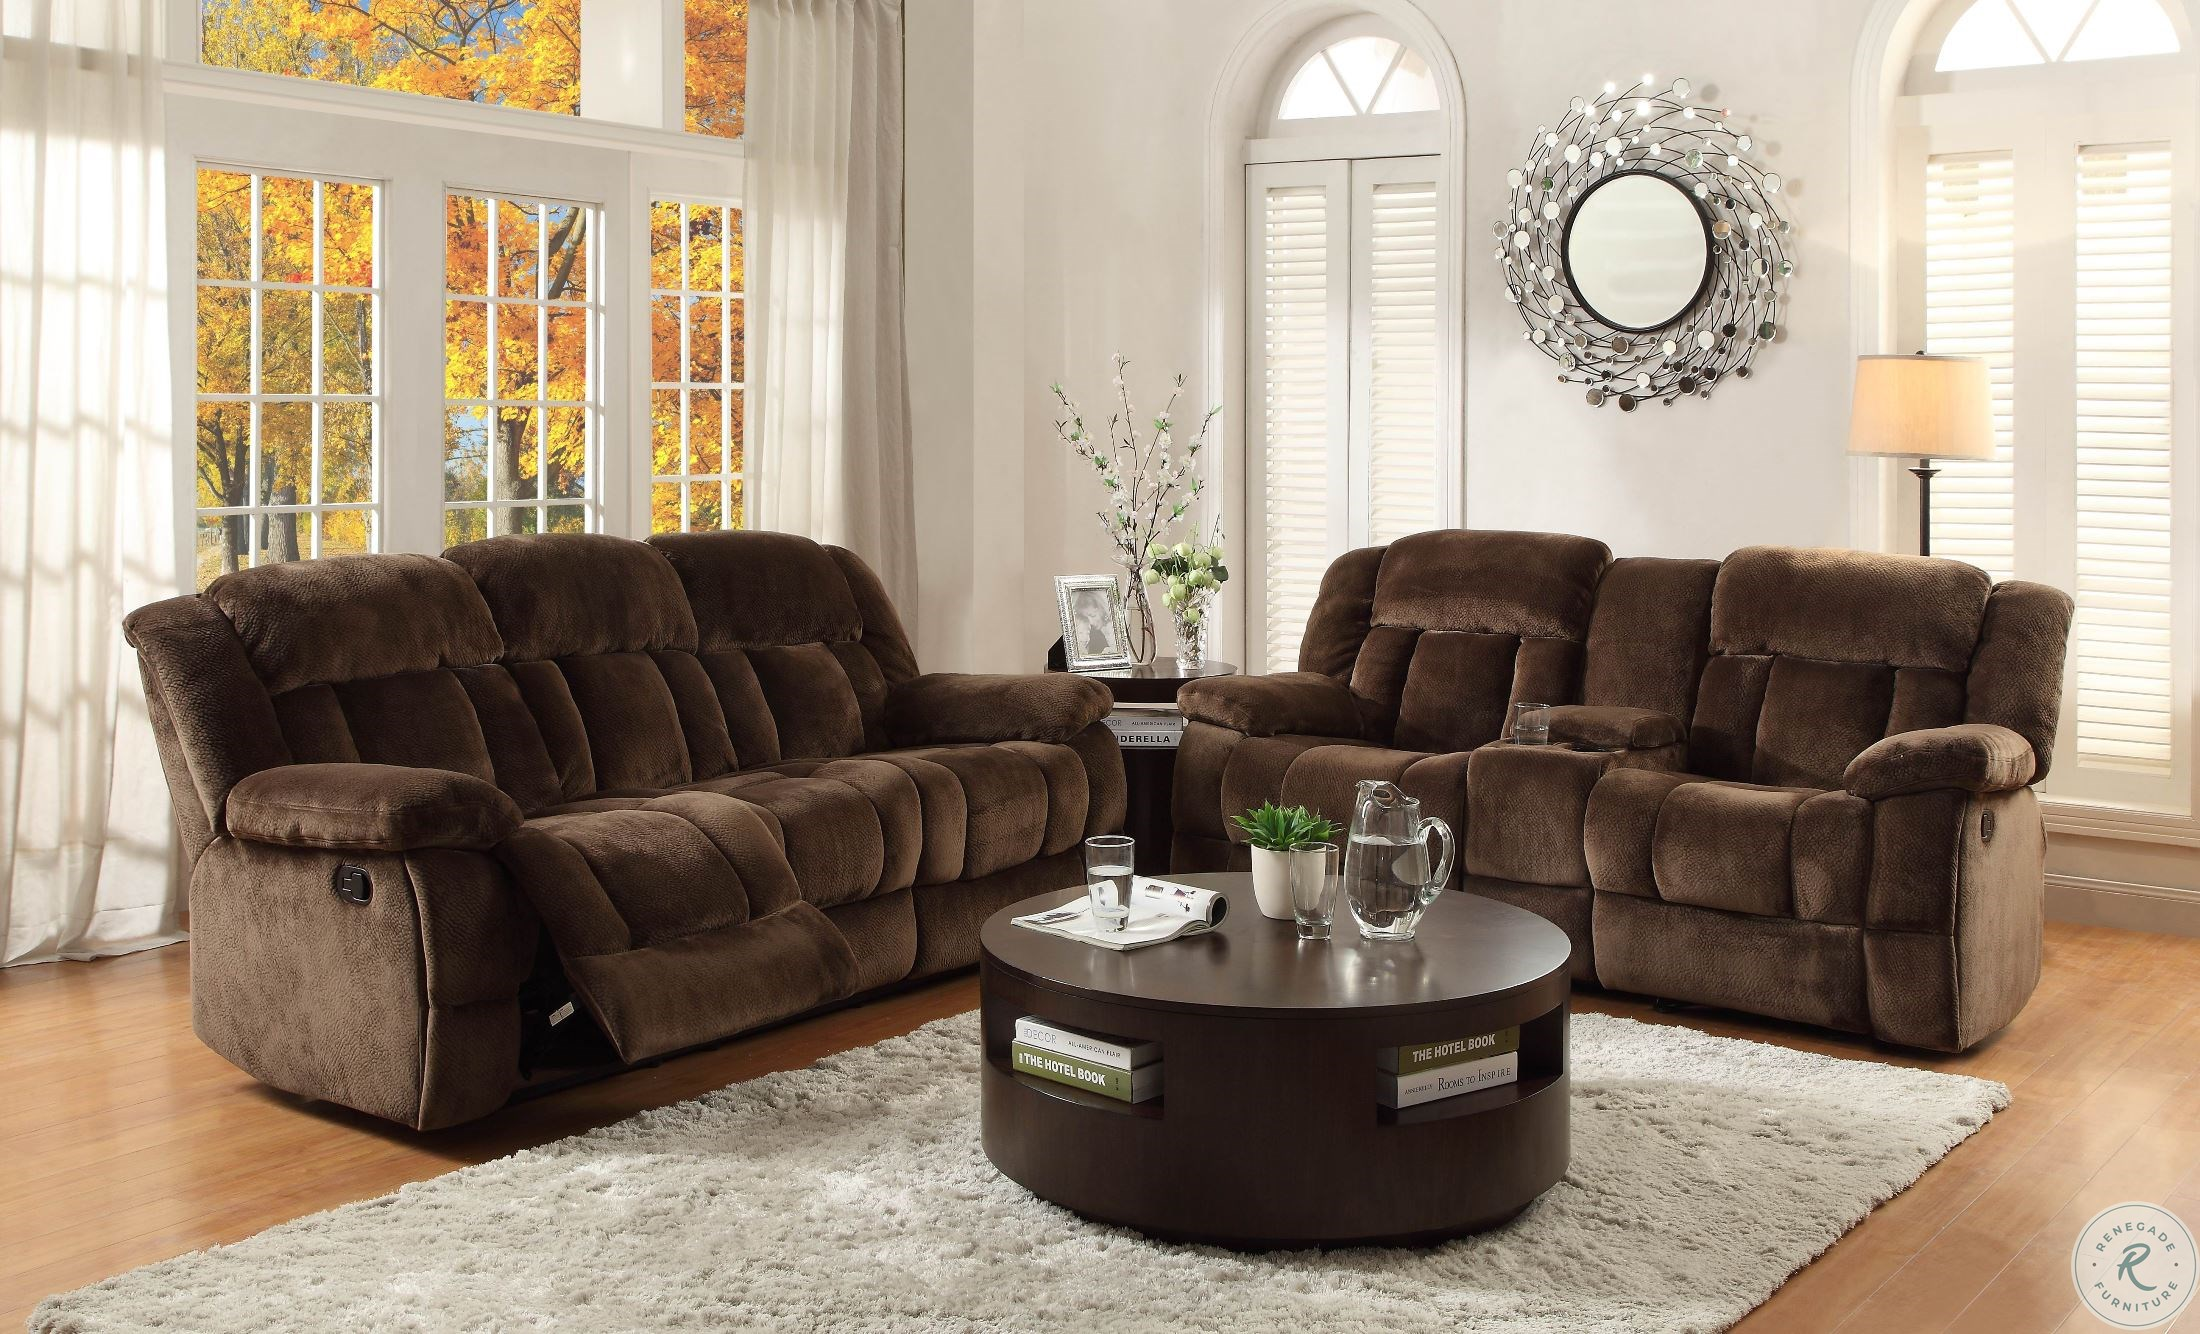 Astounding Laurelton Chocolate Double Glider Reclining Loveseat With Console Inzonedesignstudio Interior Chair Design Inzonedesignstudiocom